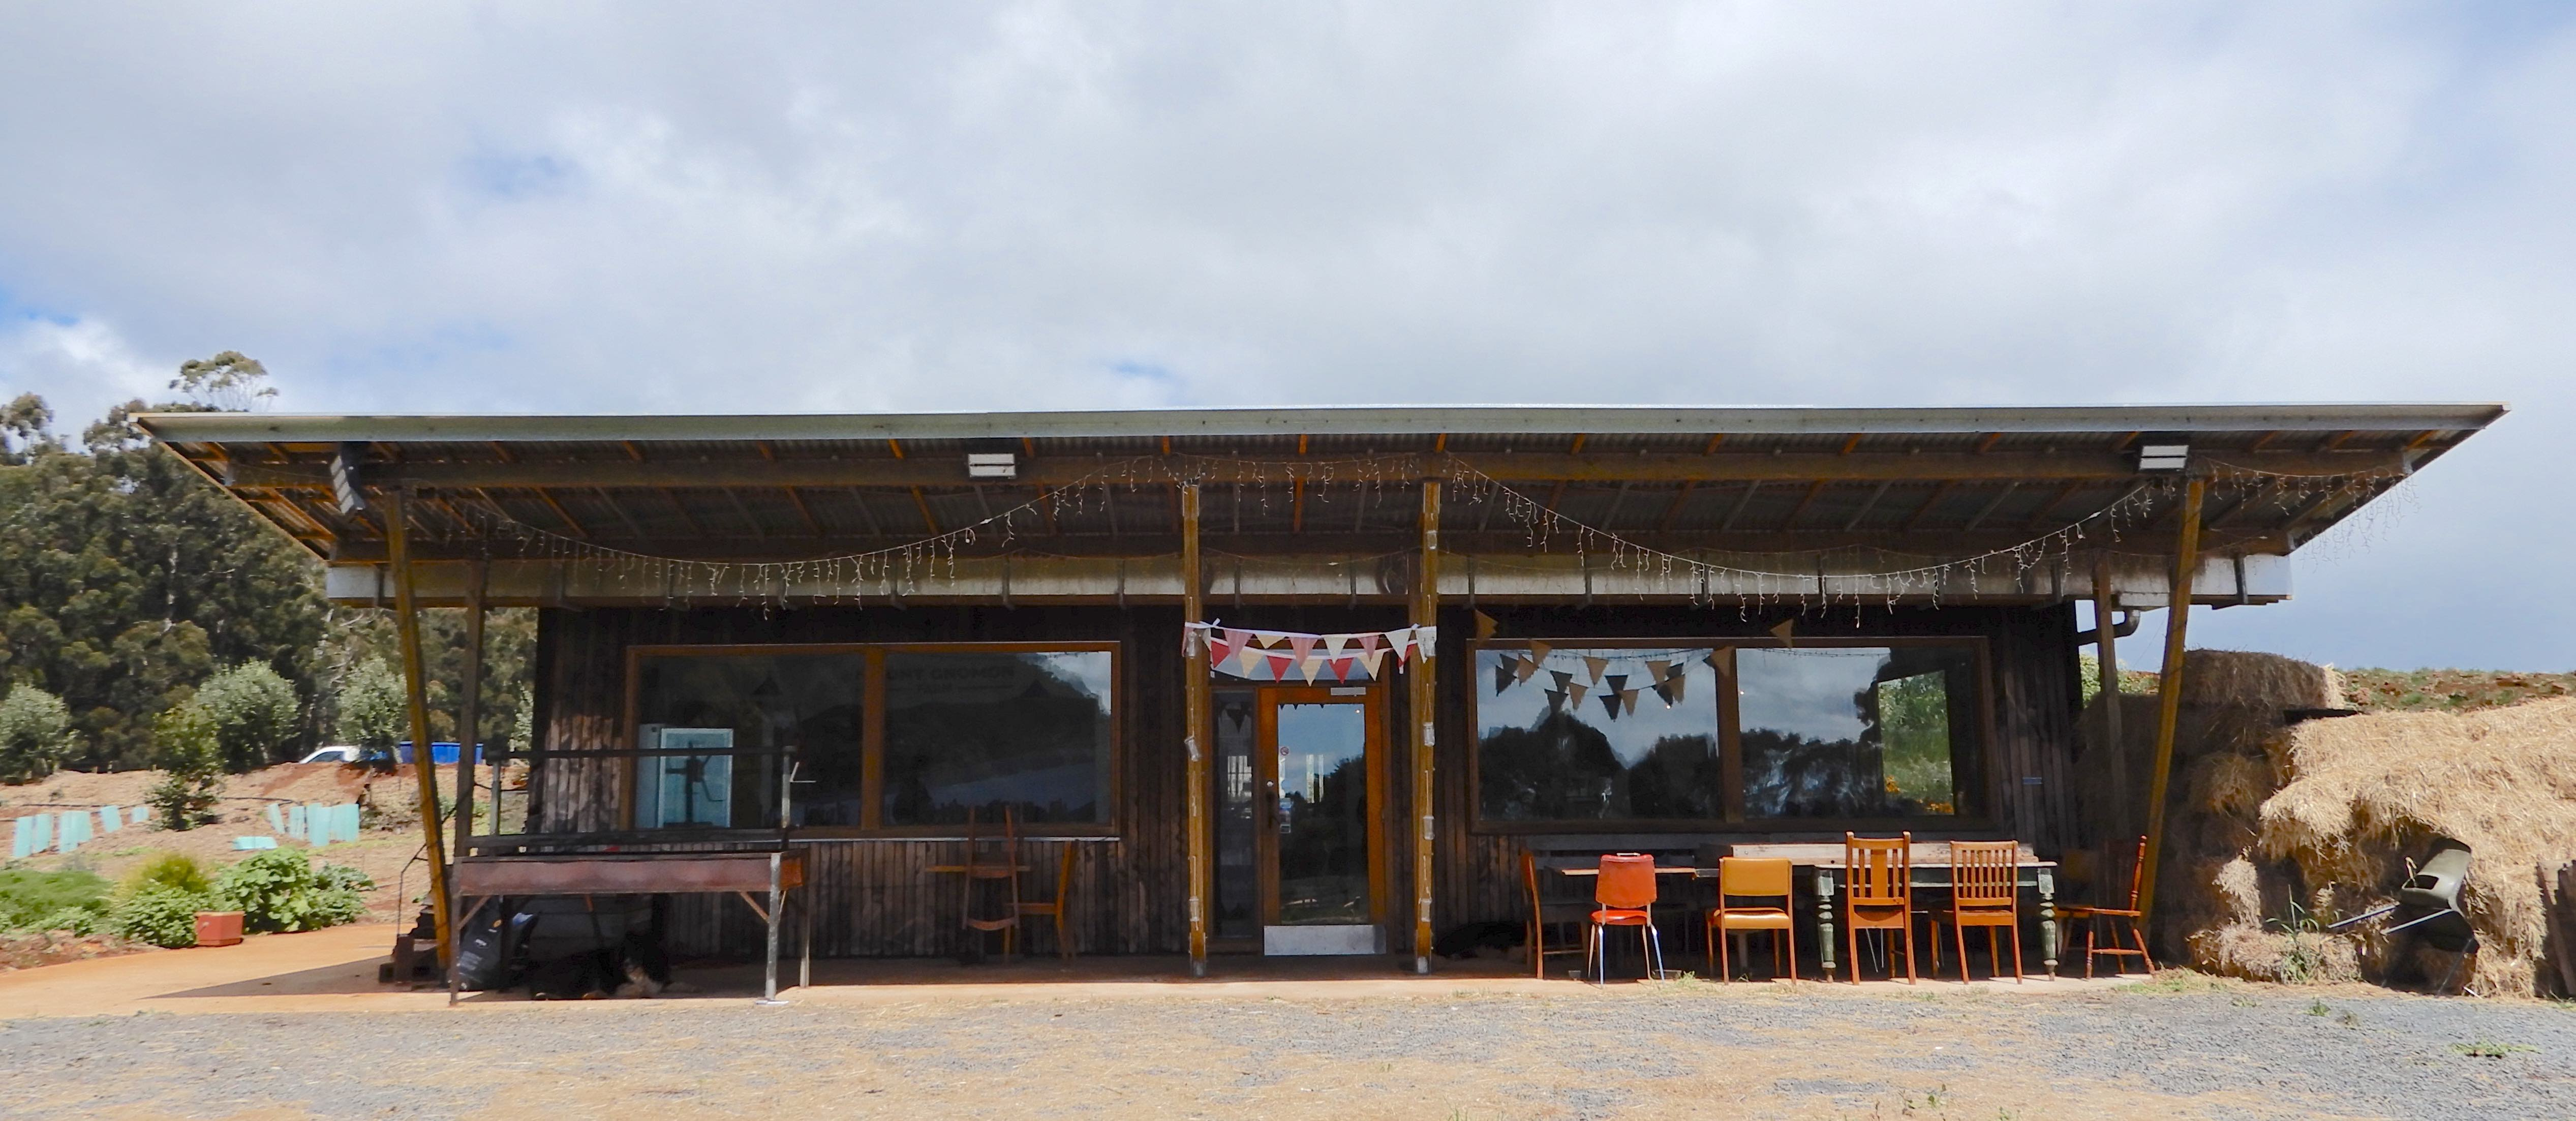 1.restaurant